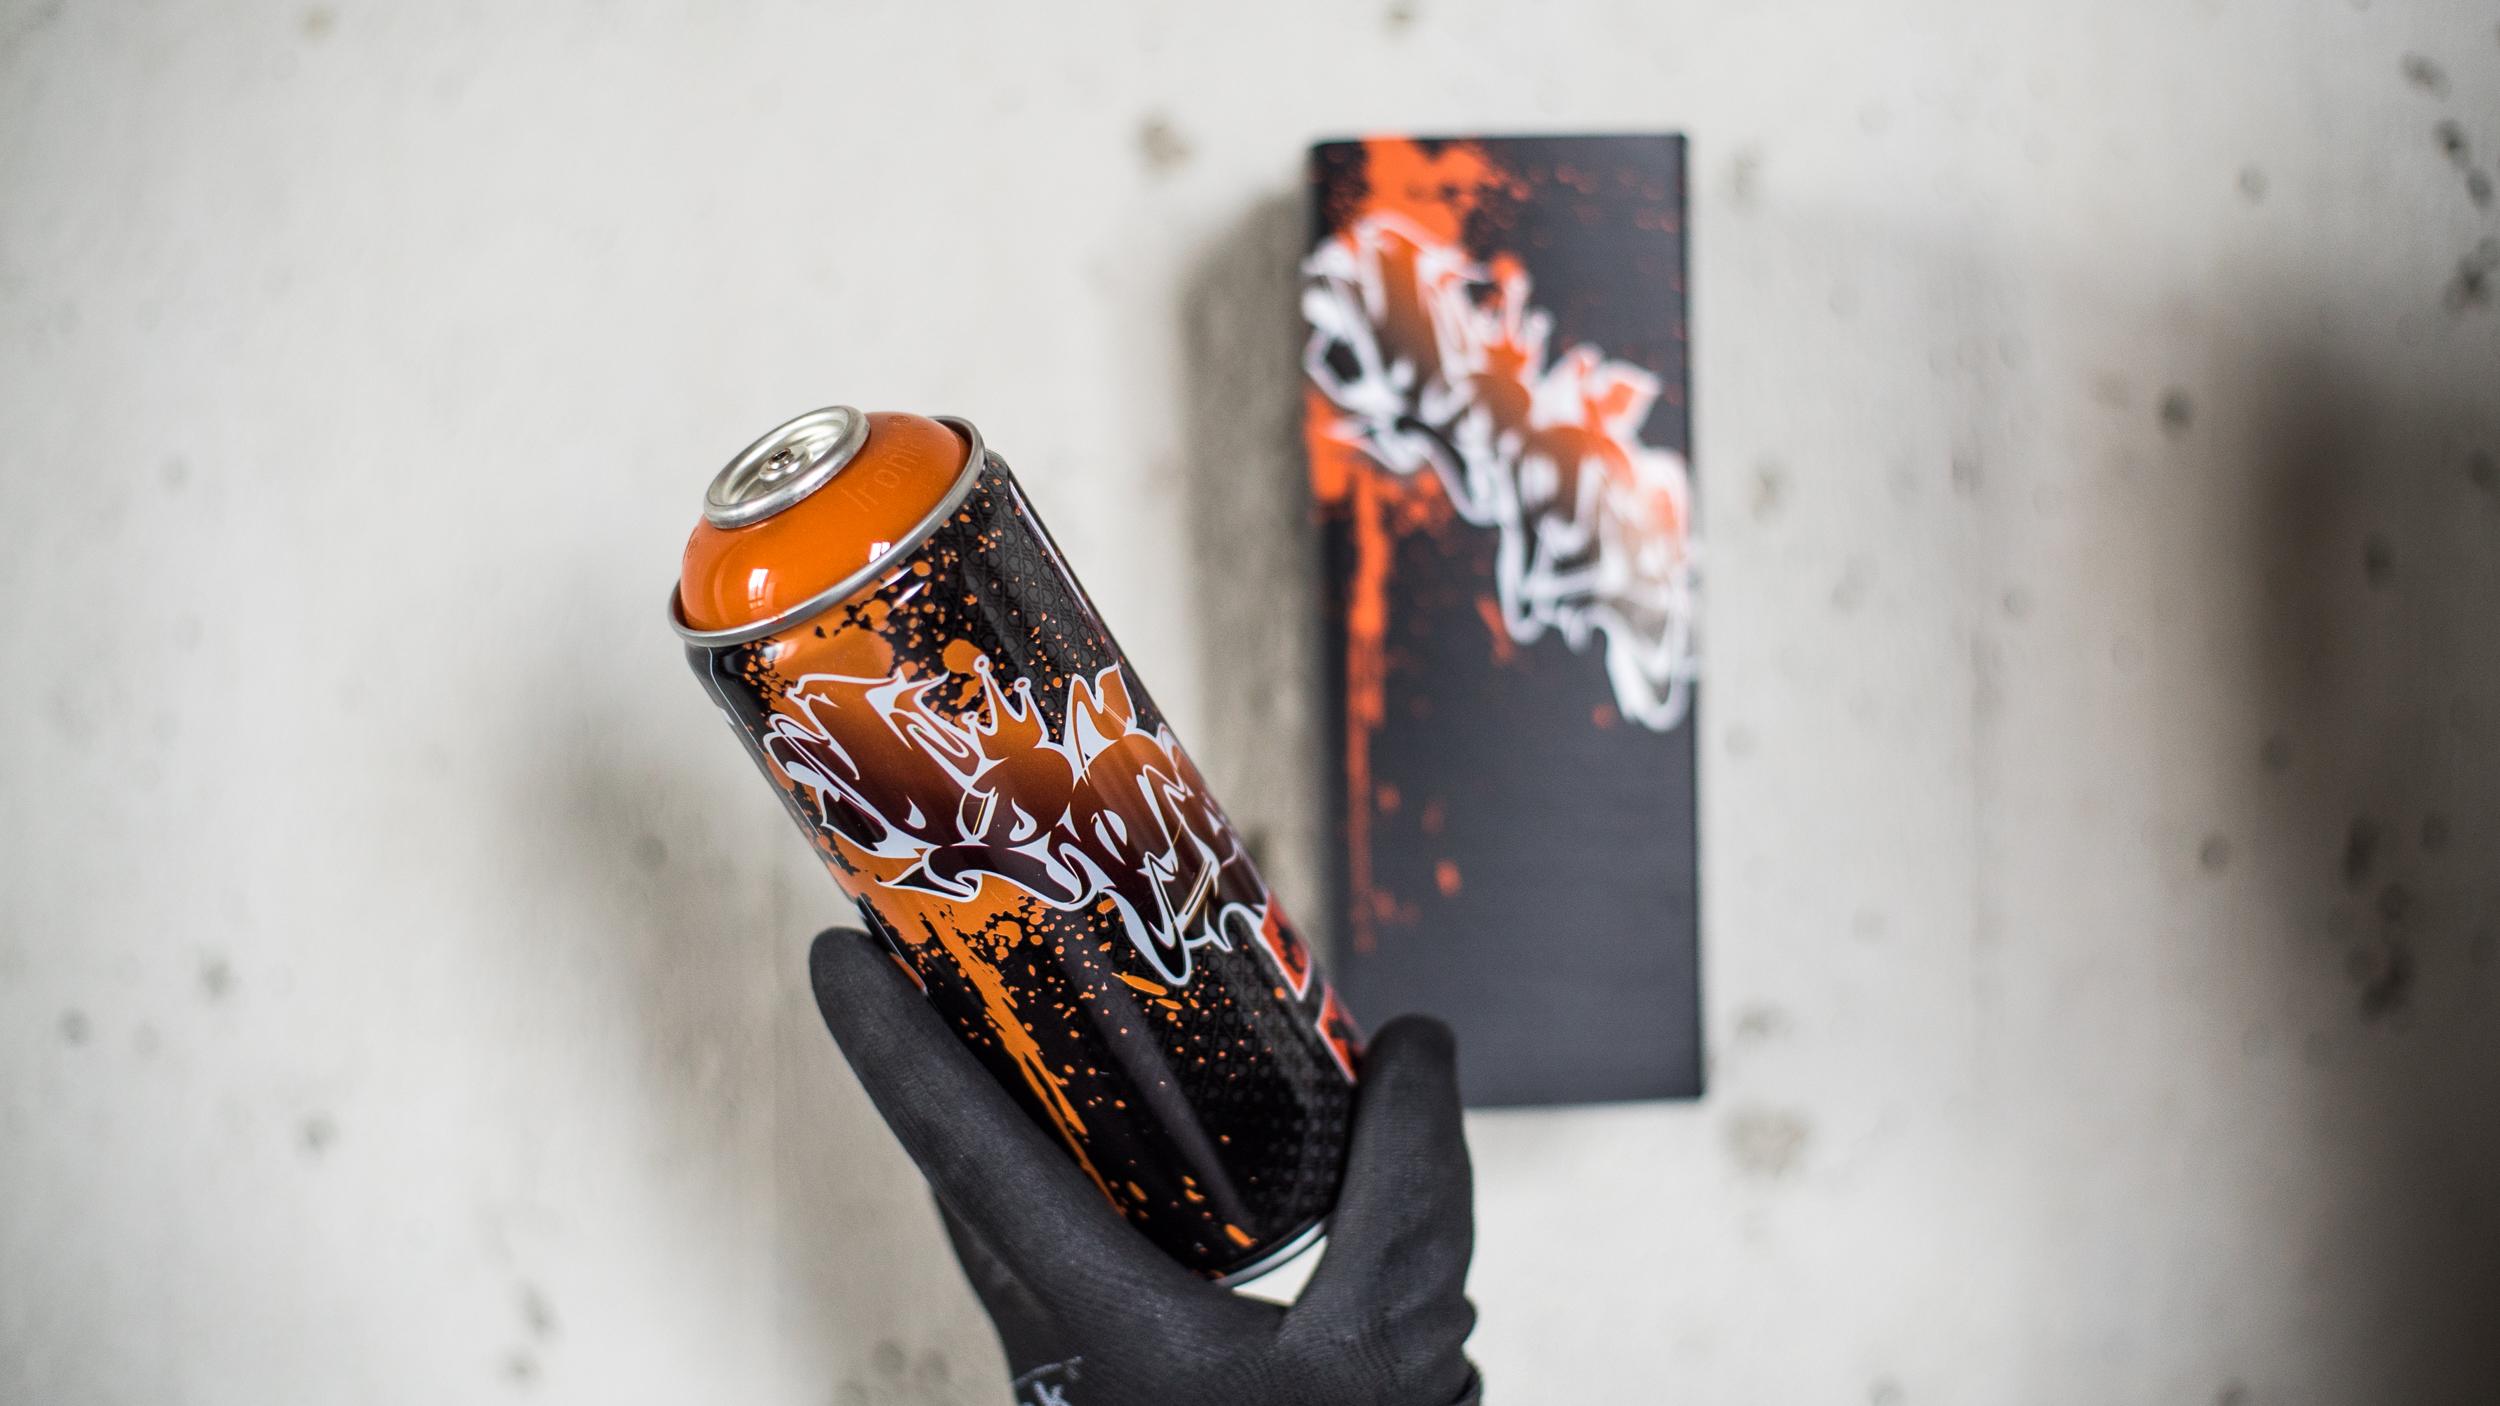 A work by Does - Spraycan dieci does box 2